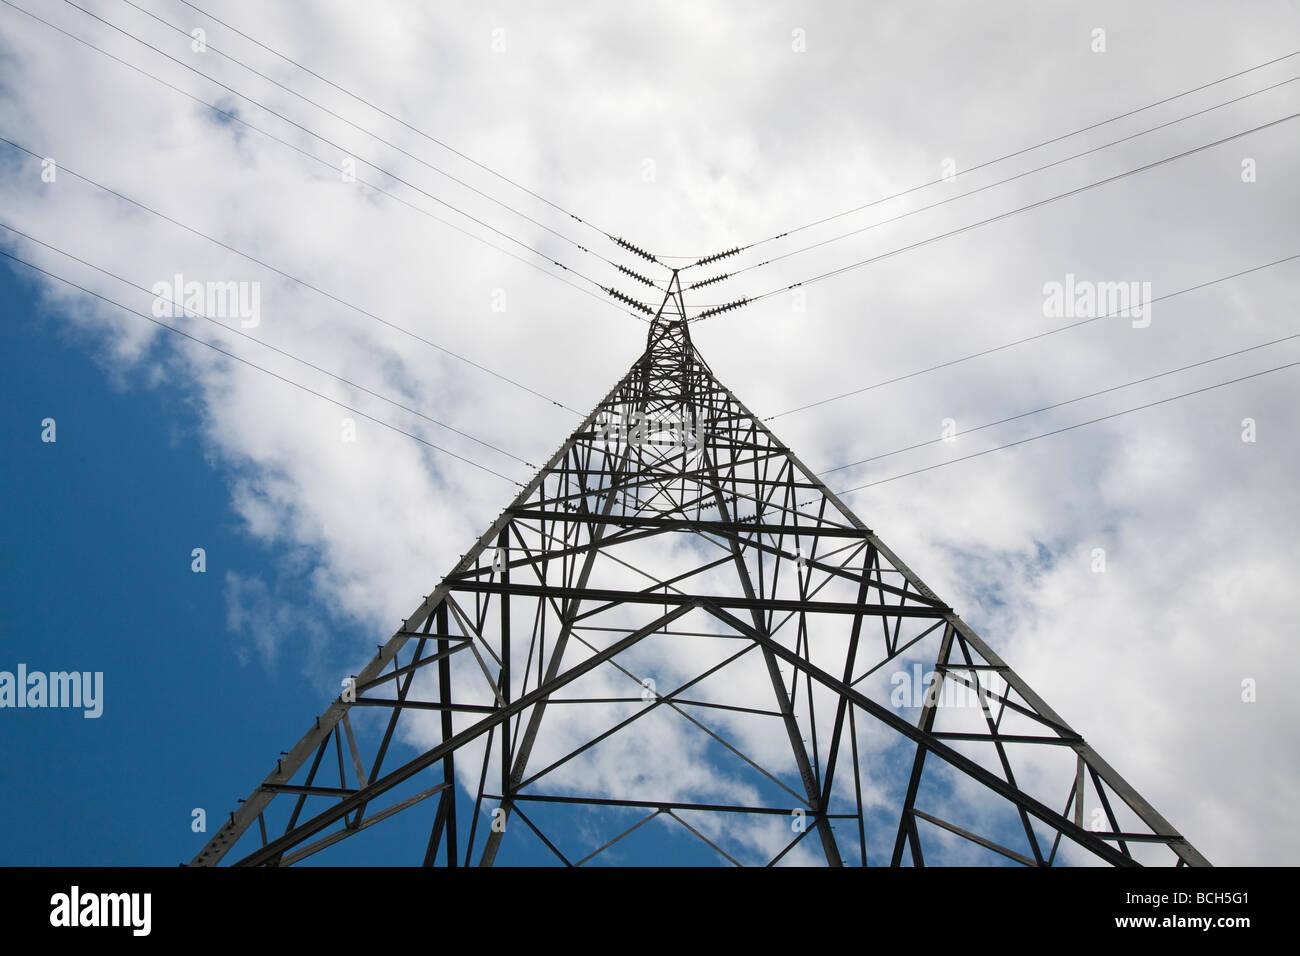 A high voltage power pylon - Stock Image